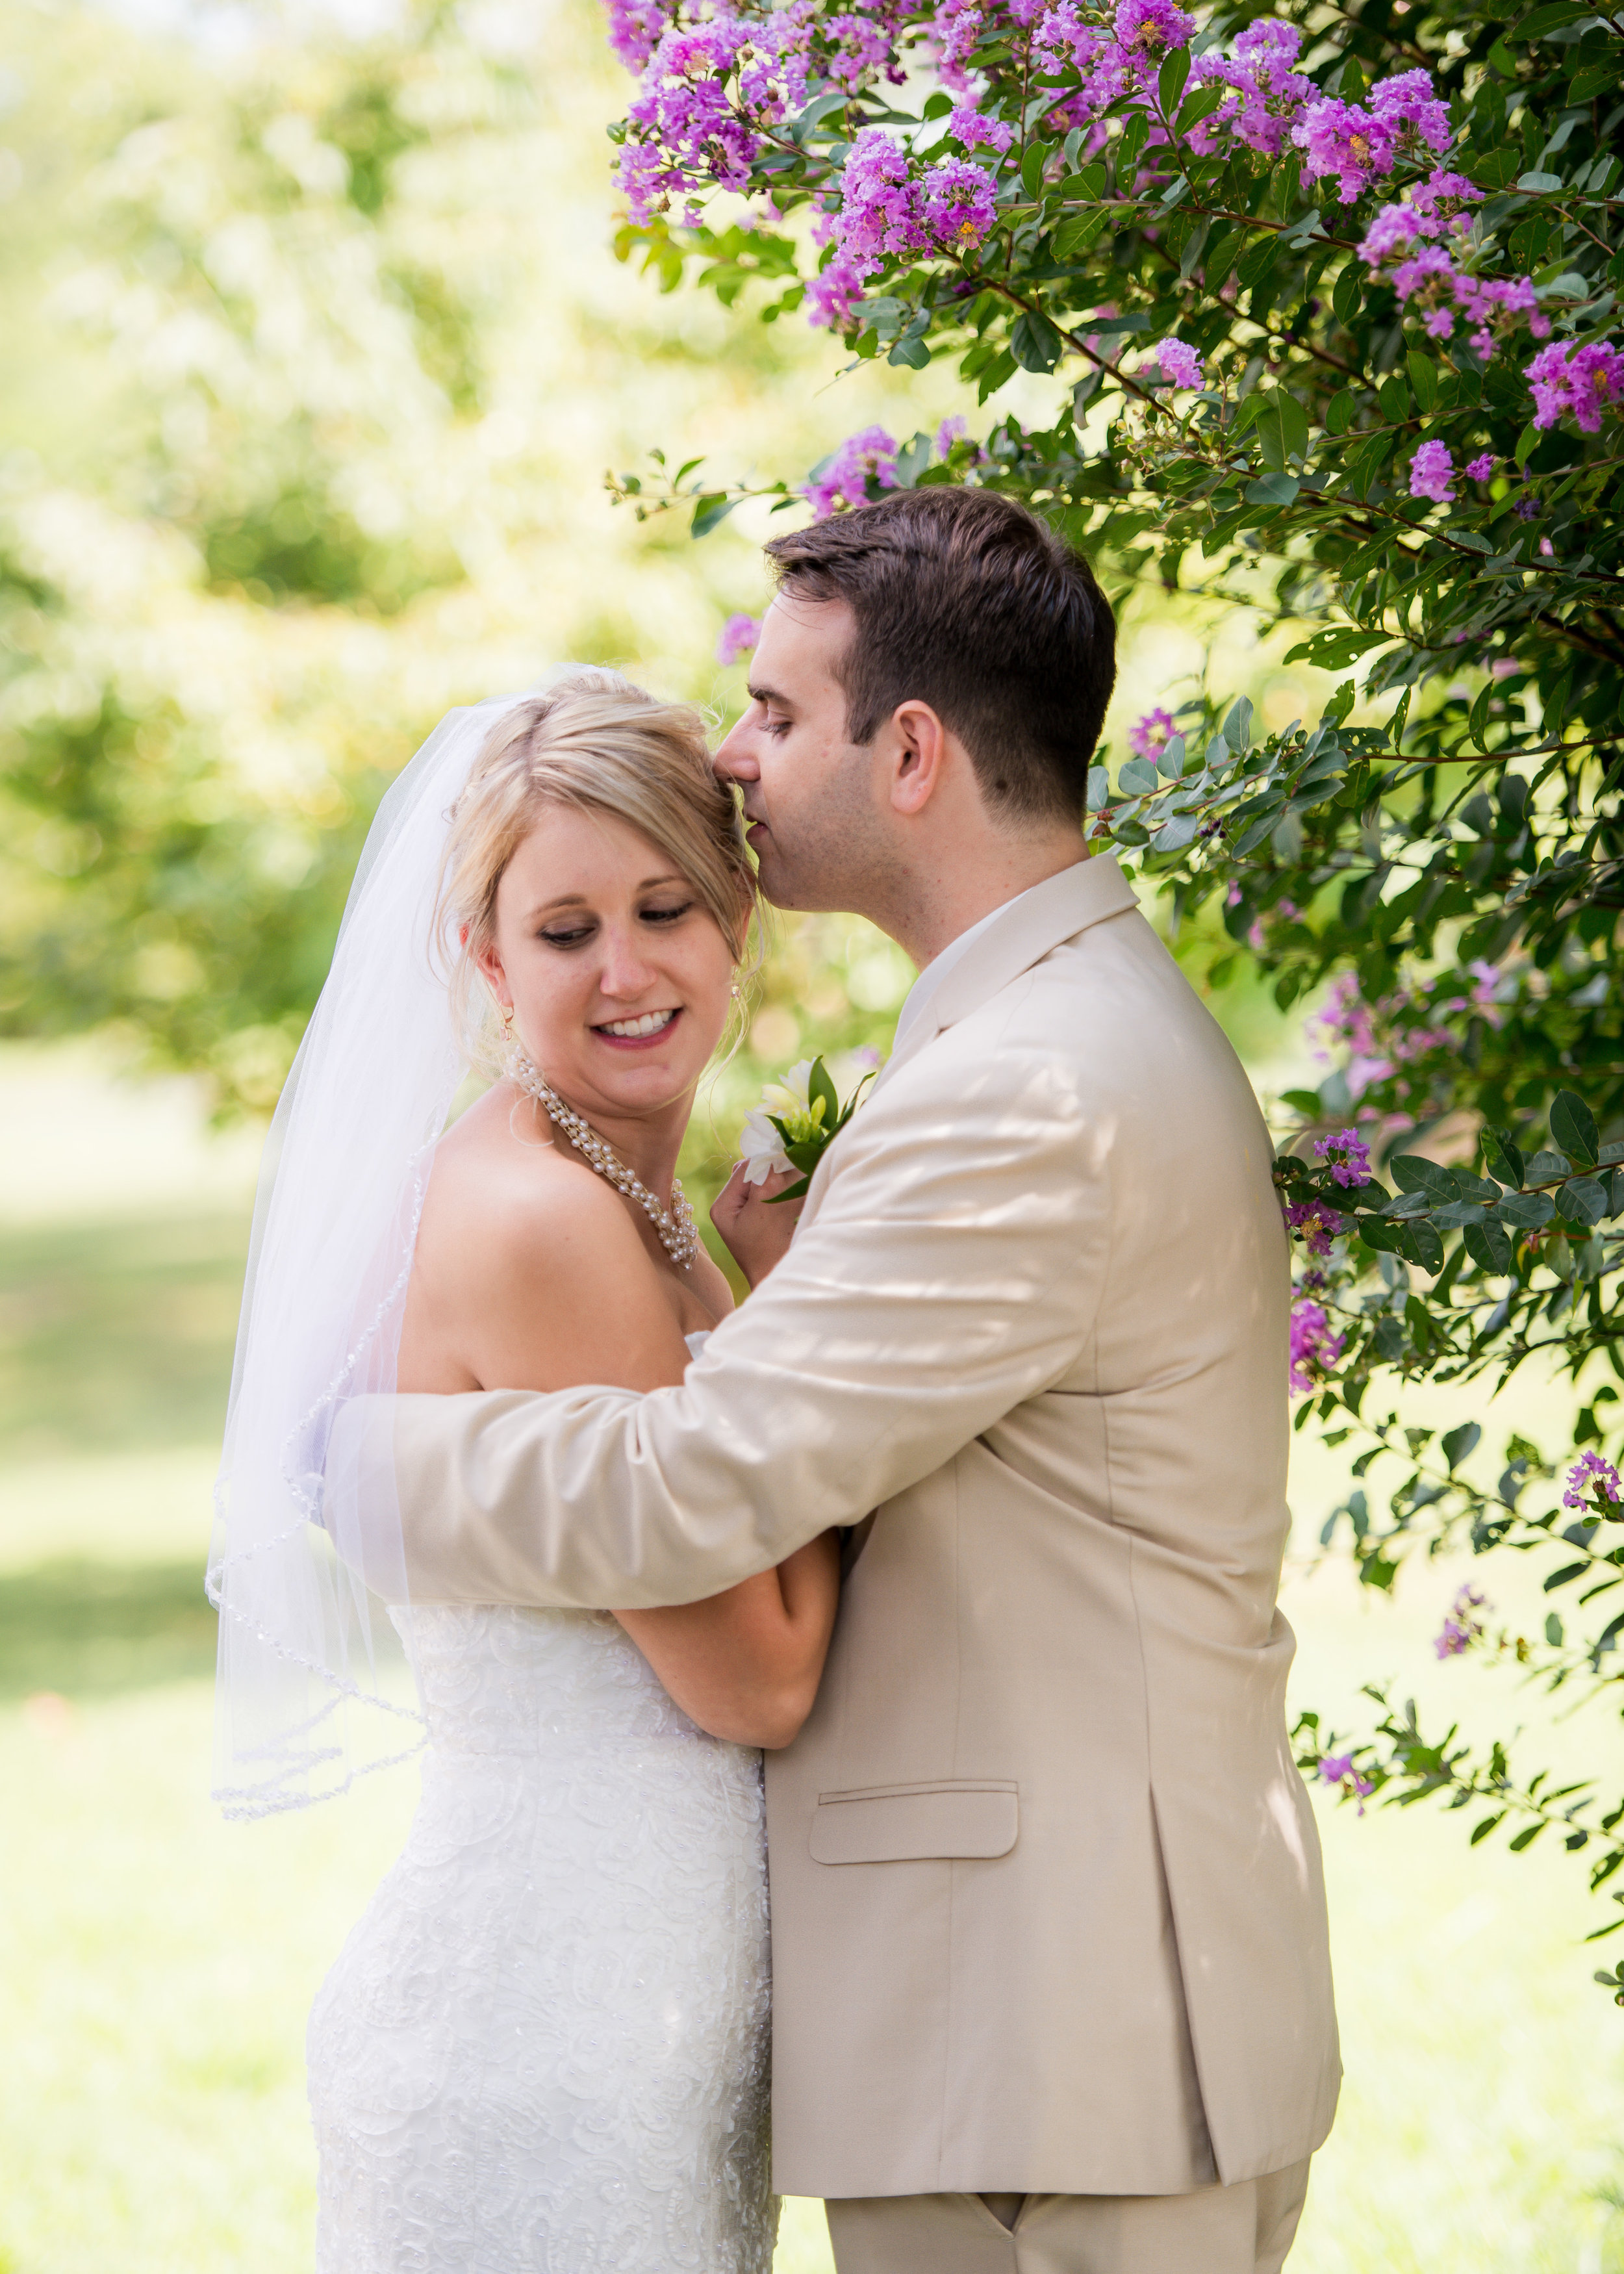 Justin + Amanda_Married407 copy.jpg